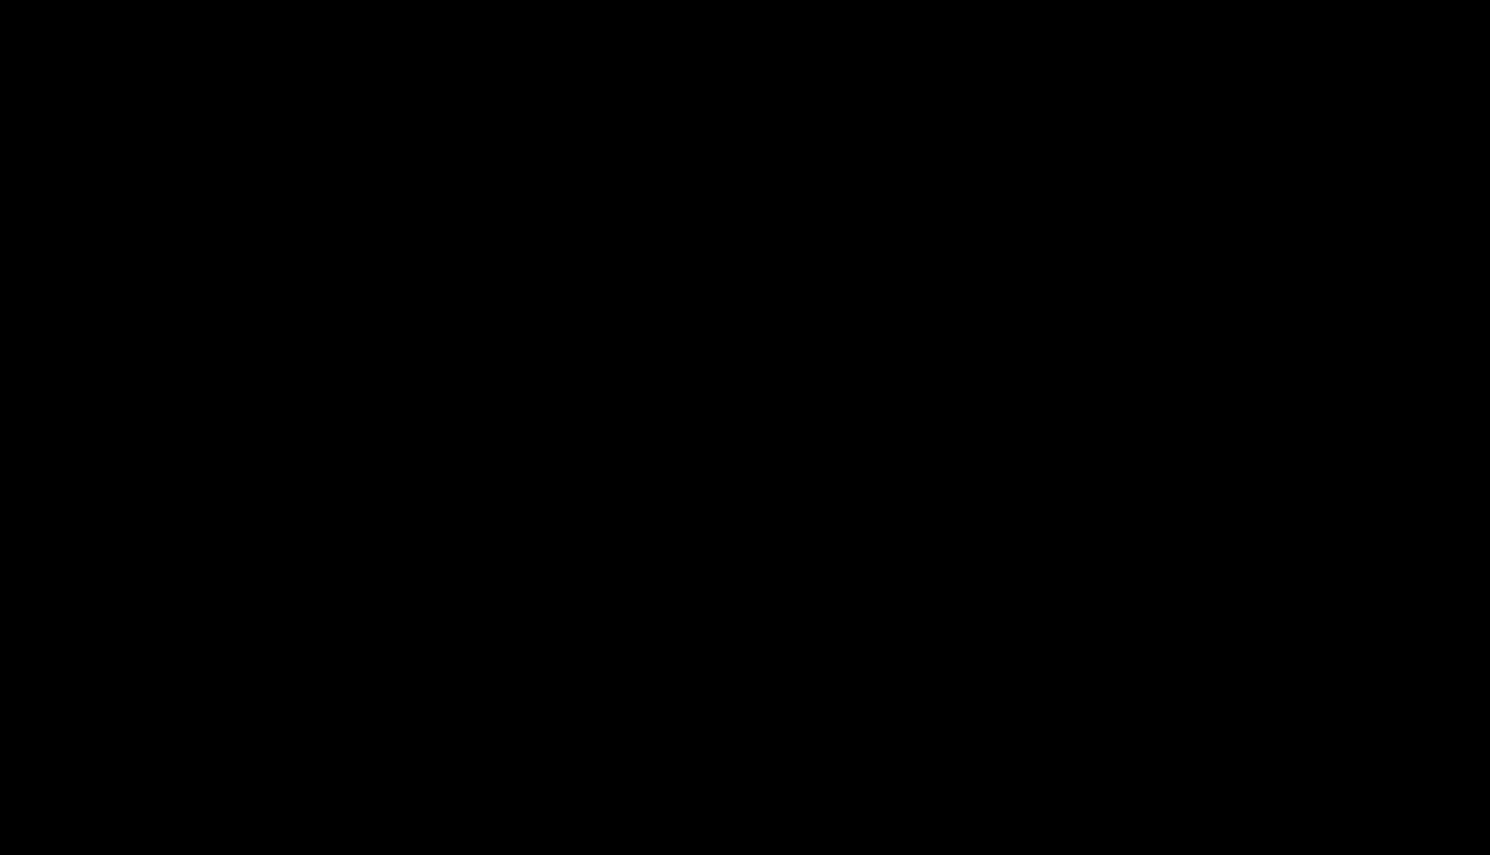 5-Aminopyrazole-1-carboxylic Acid Tert-butyl Ester O